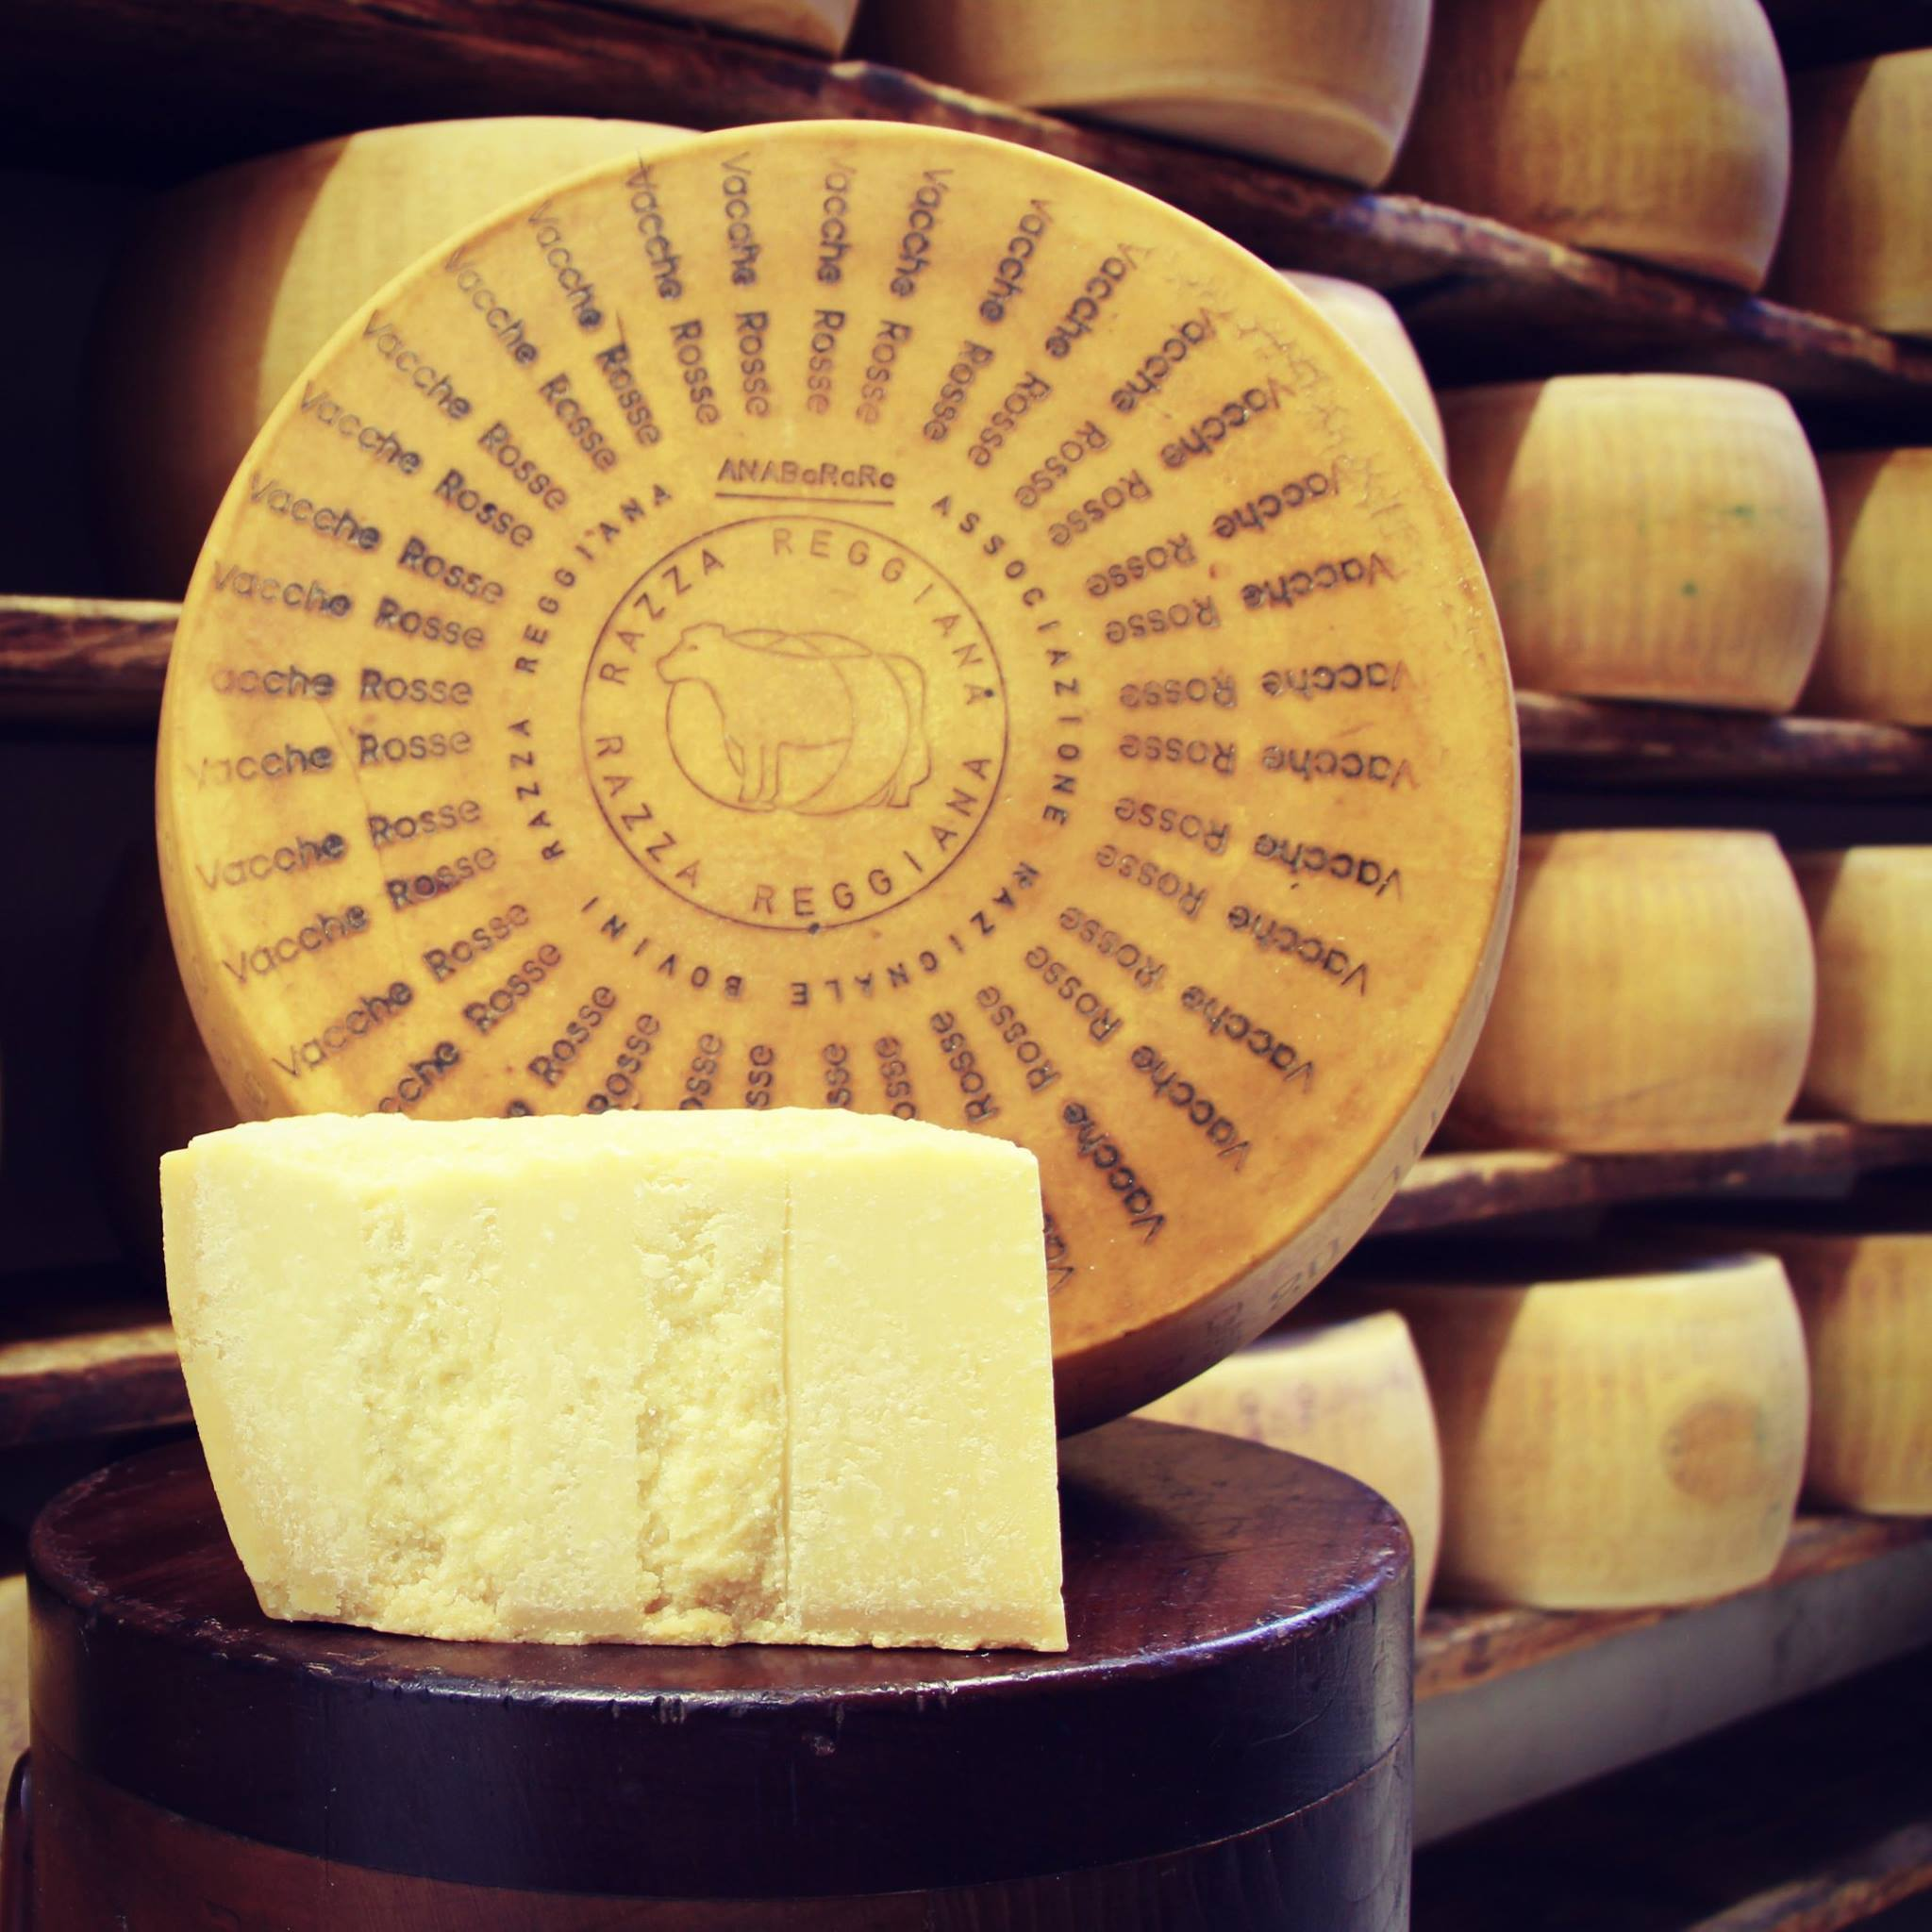 Parmigiano Reggiano Vaches Rouges 30 mois